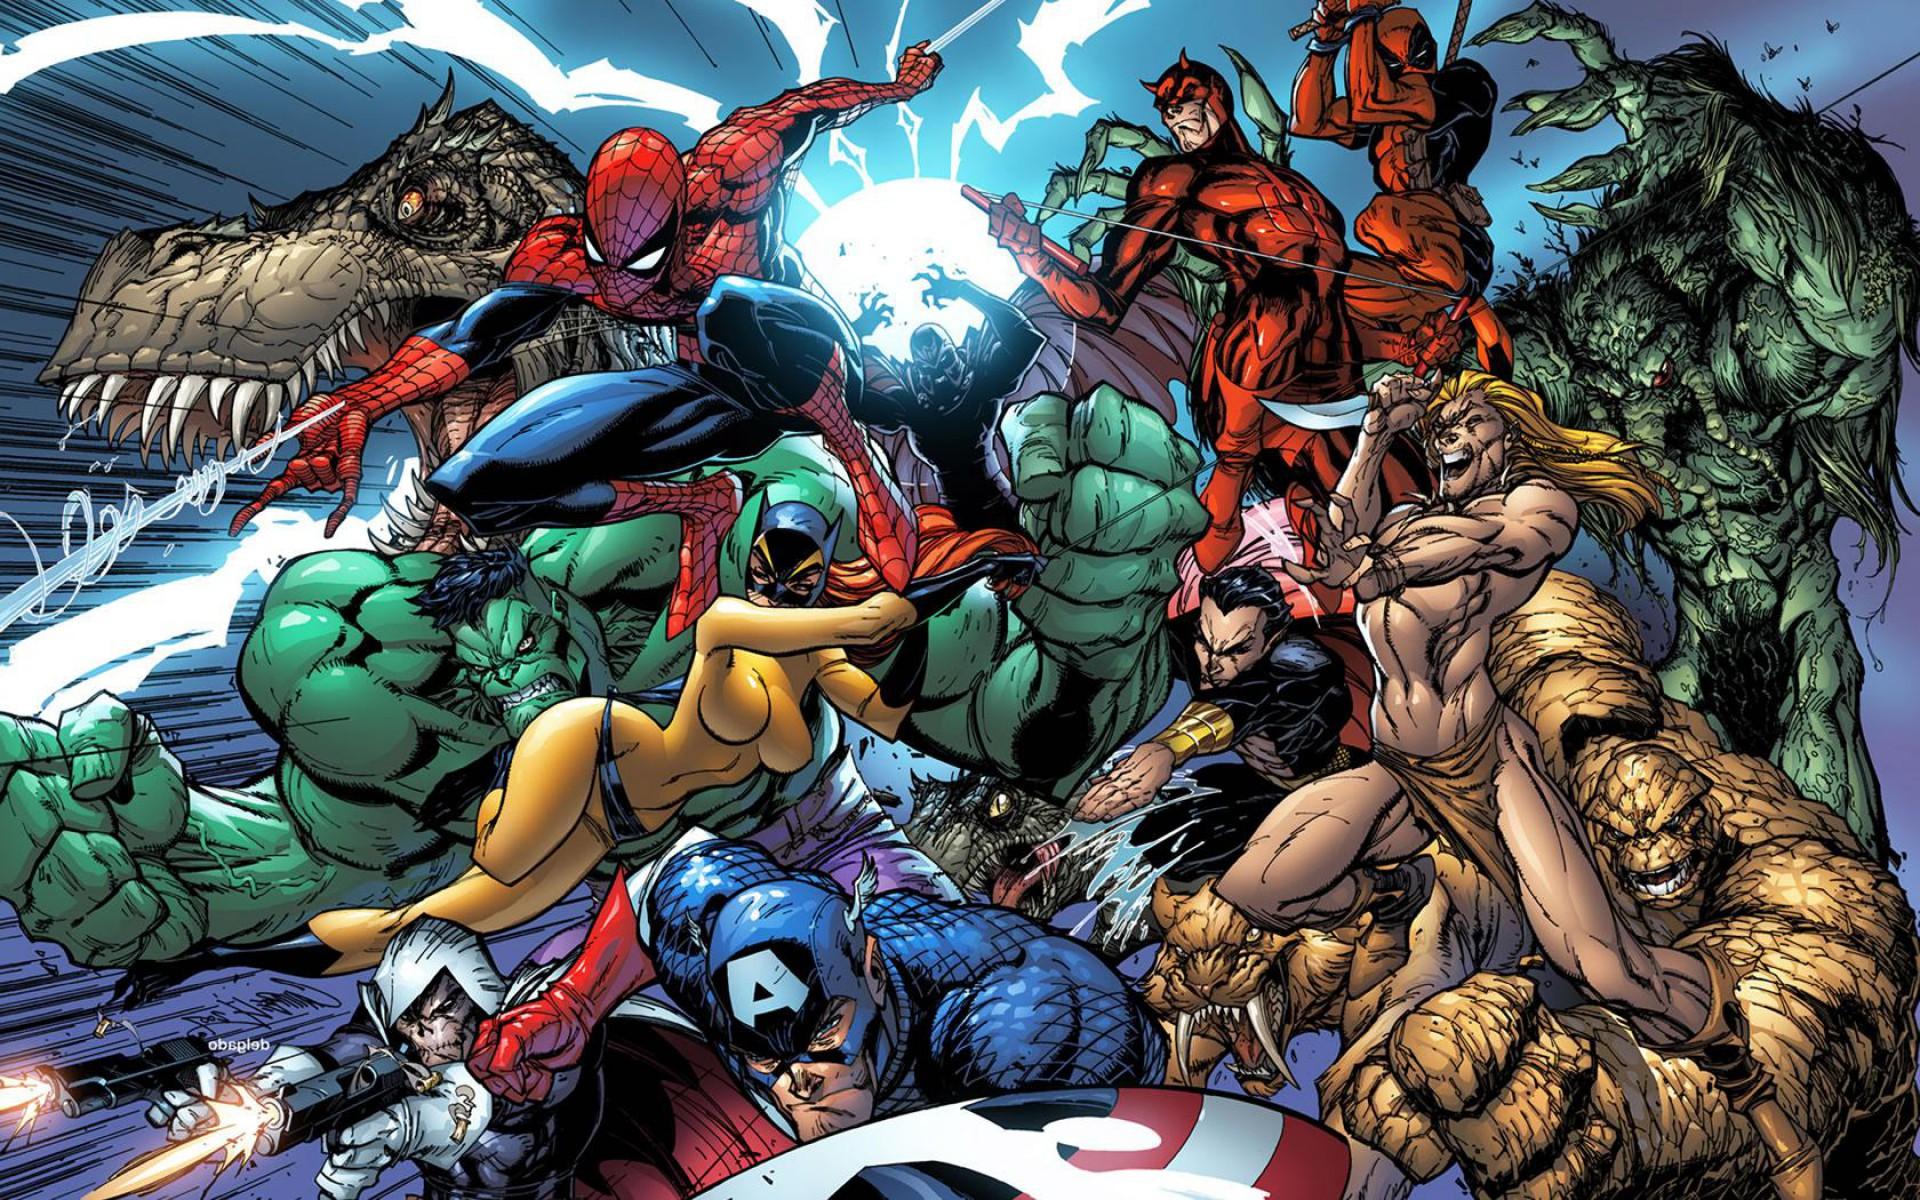 Marvel wallpapers heroes hd desktop wallpapers 4k hd - Marvel hd wallpapers 4k ...